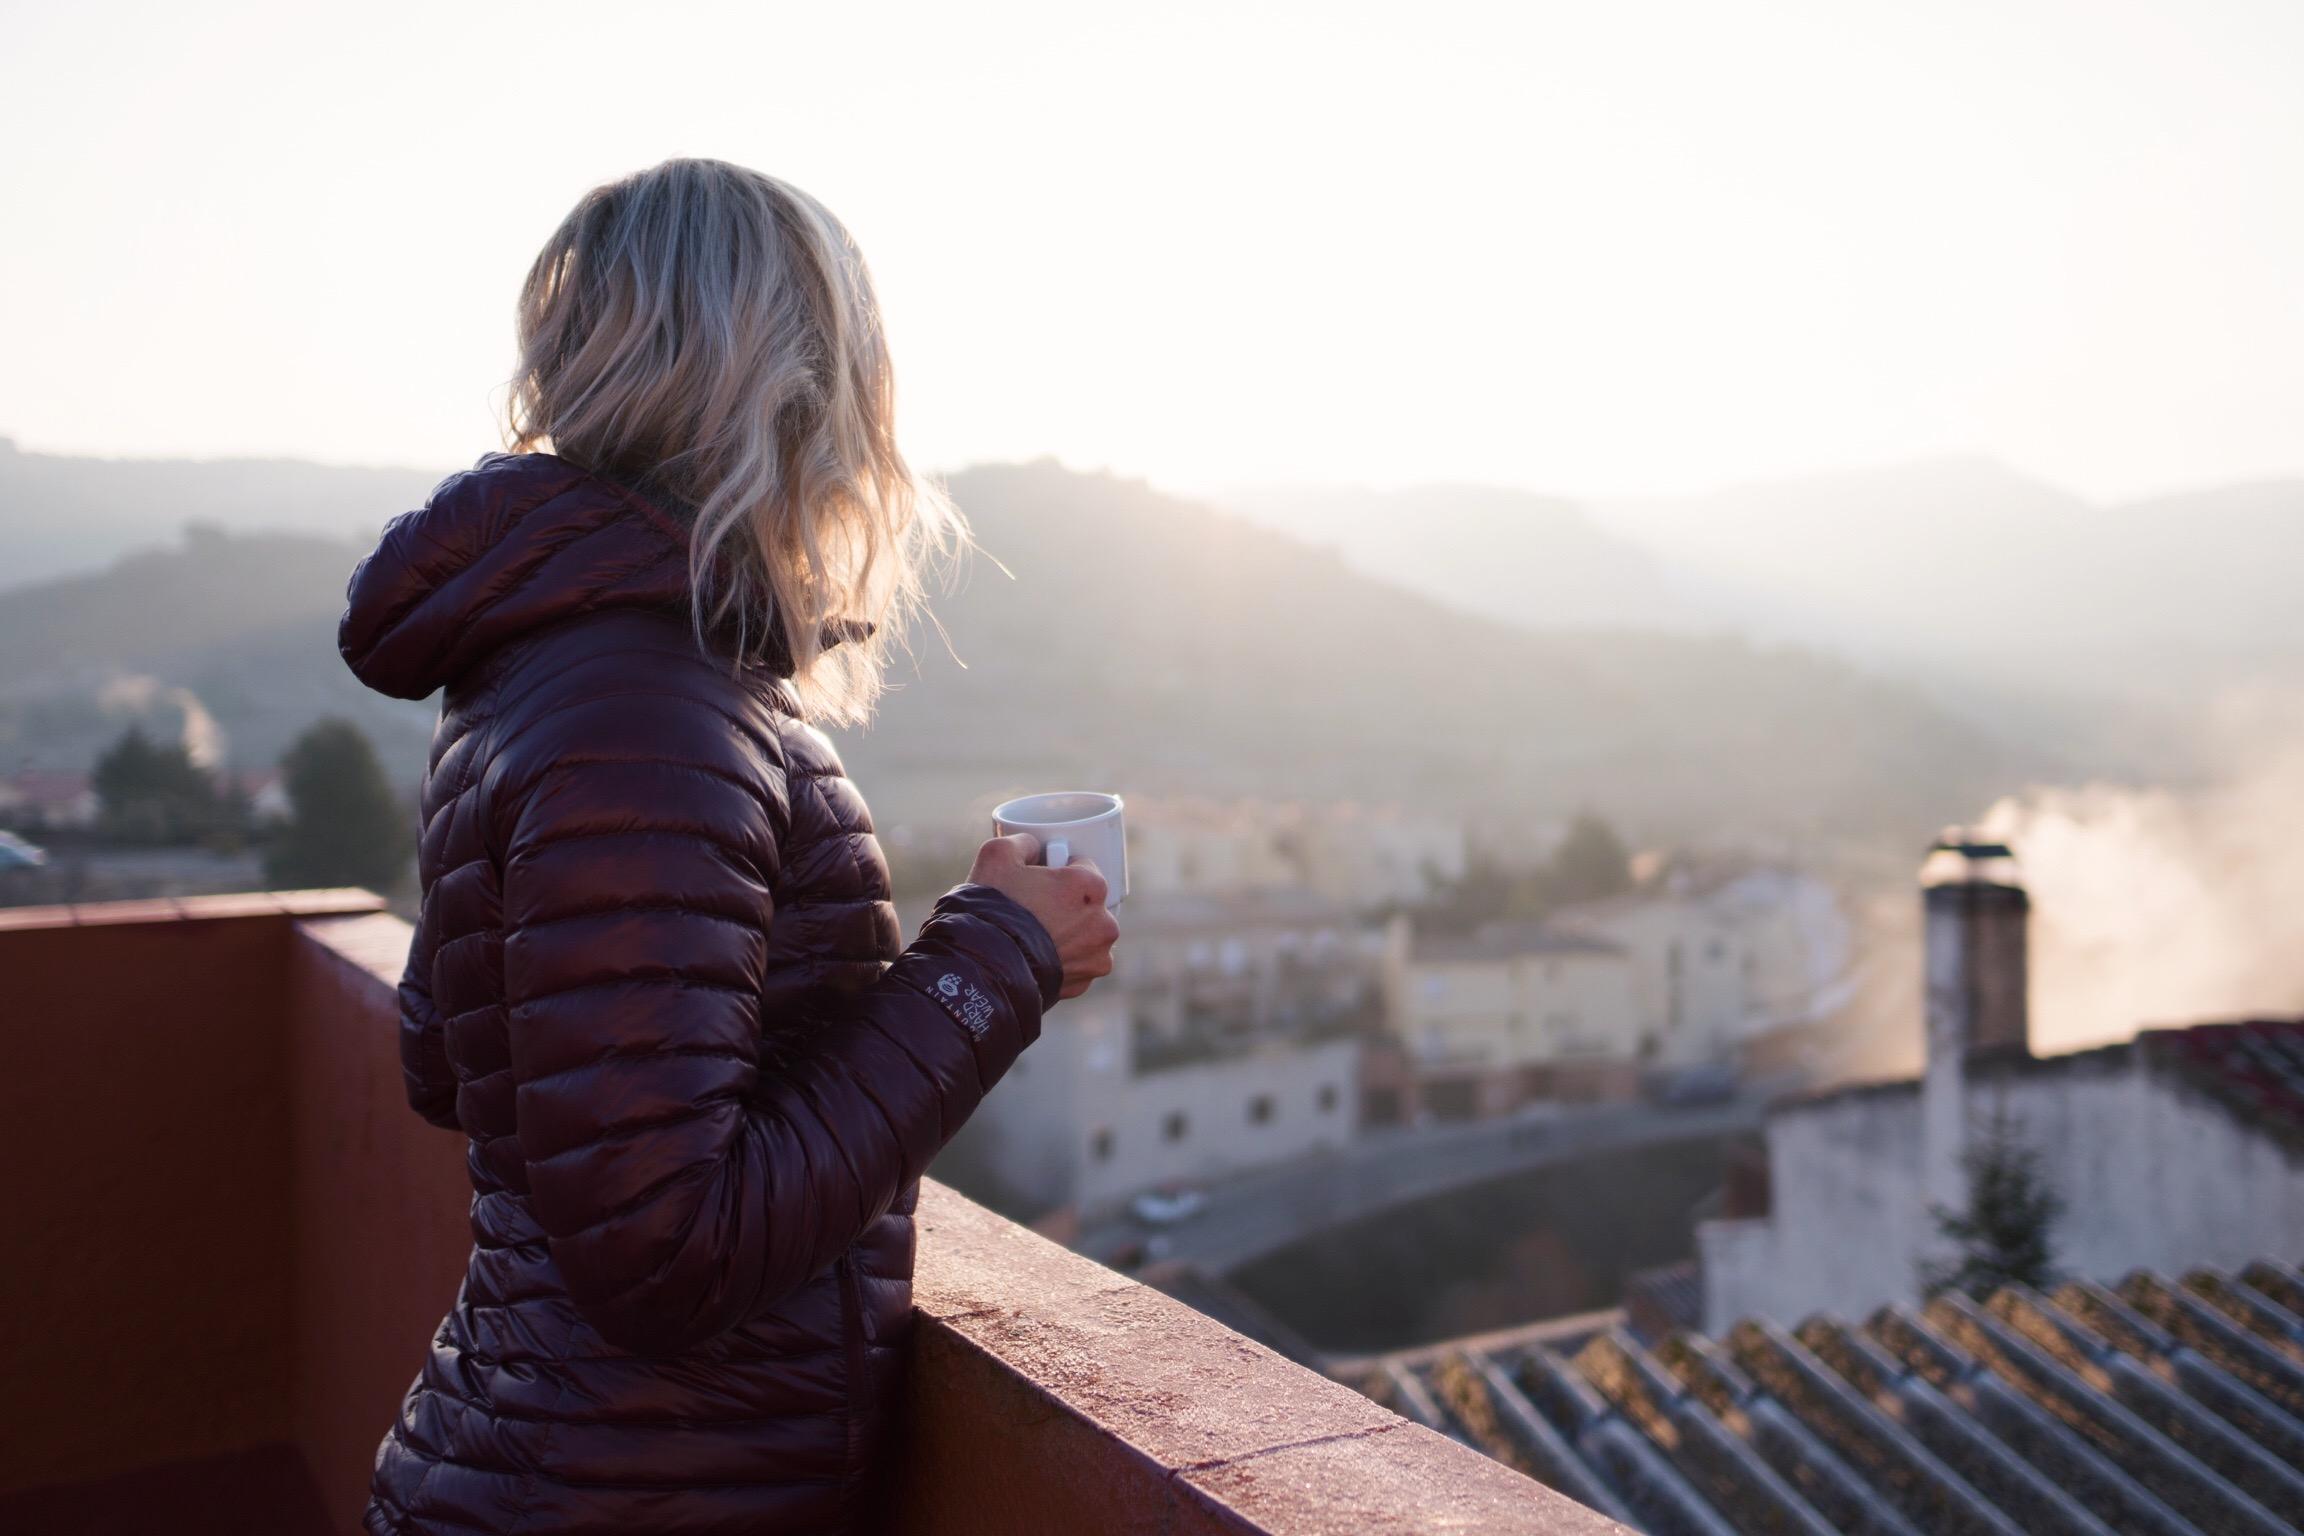 Morning coffee in Cornudella, Spain!